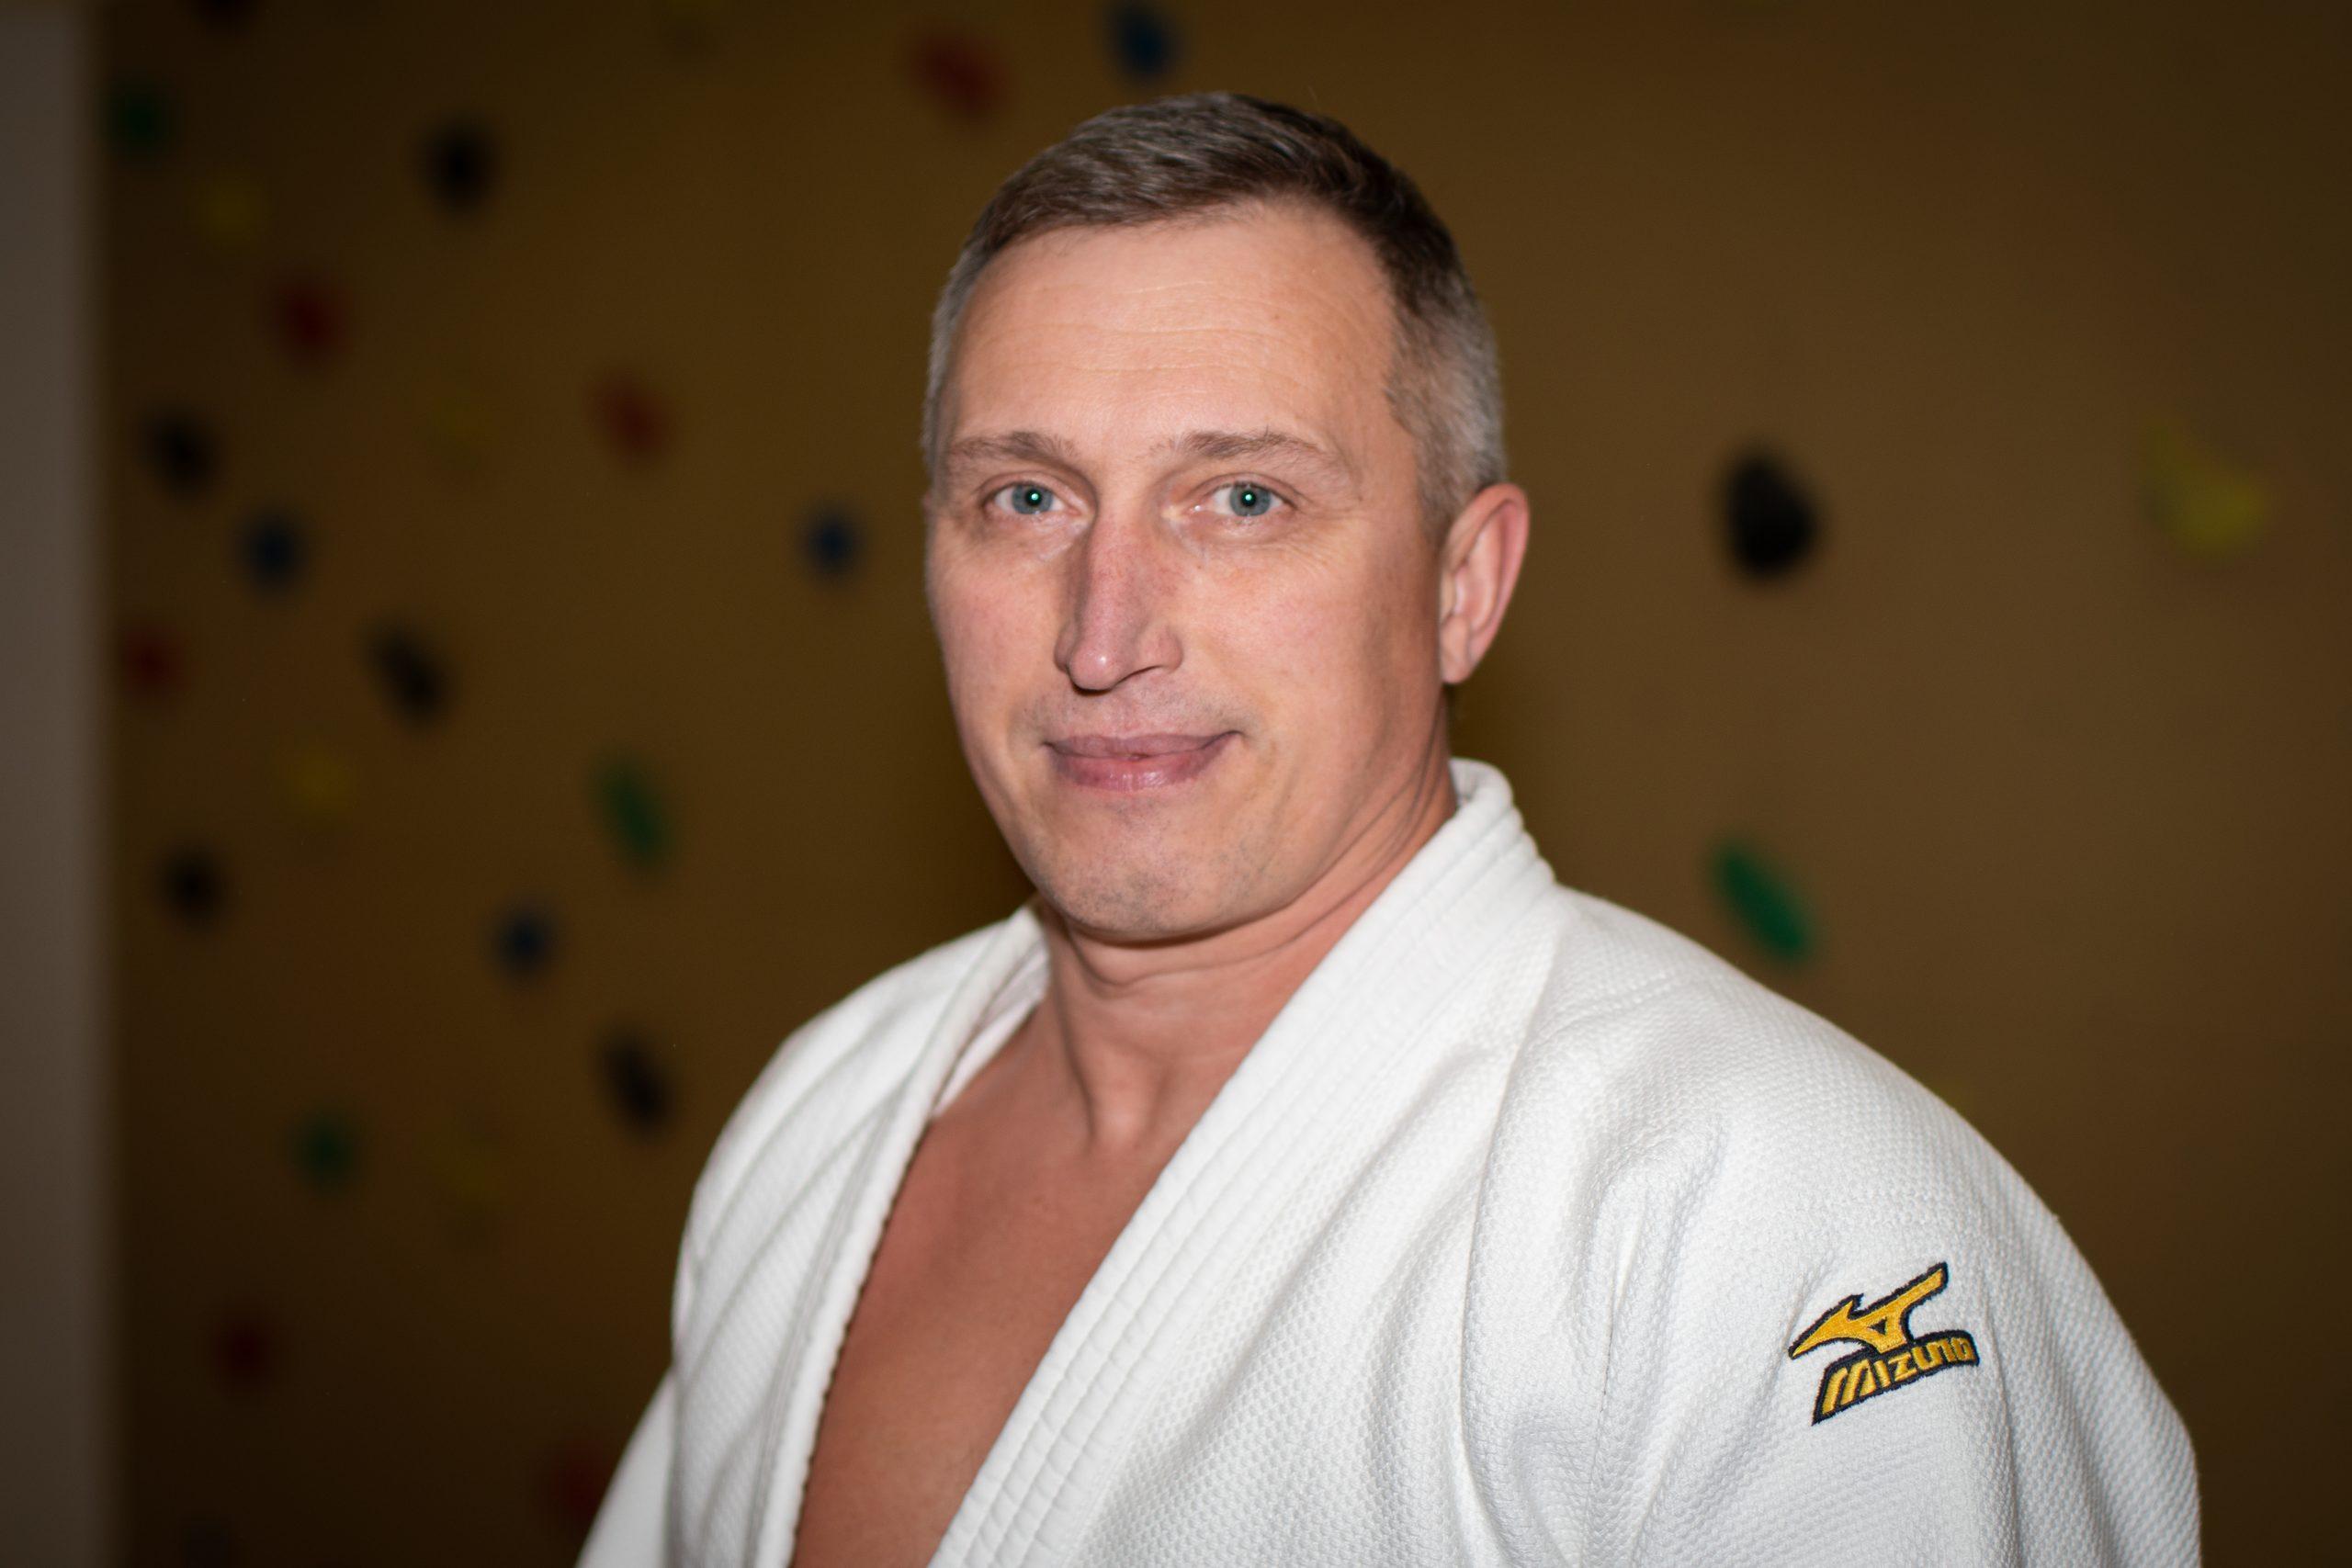 https://vfl-geesthacht.de/wp-content/uploads/2020/04/MF_VFL_Judo_Trainer_Alexander_Krivzov-scaled.jpg